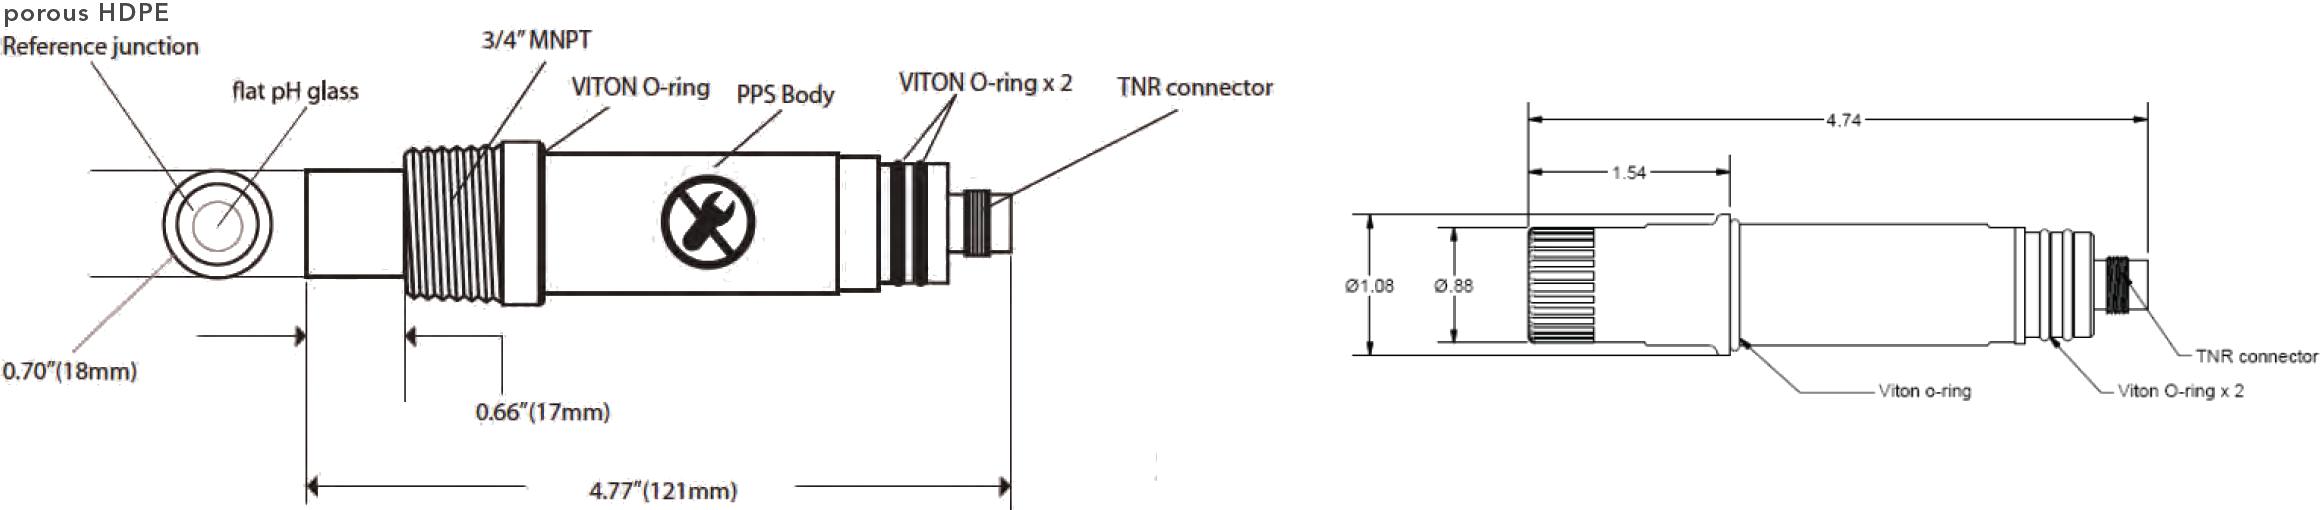 S8000 Dimensions Diagram